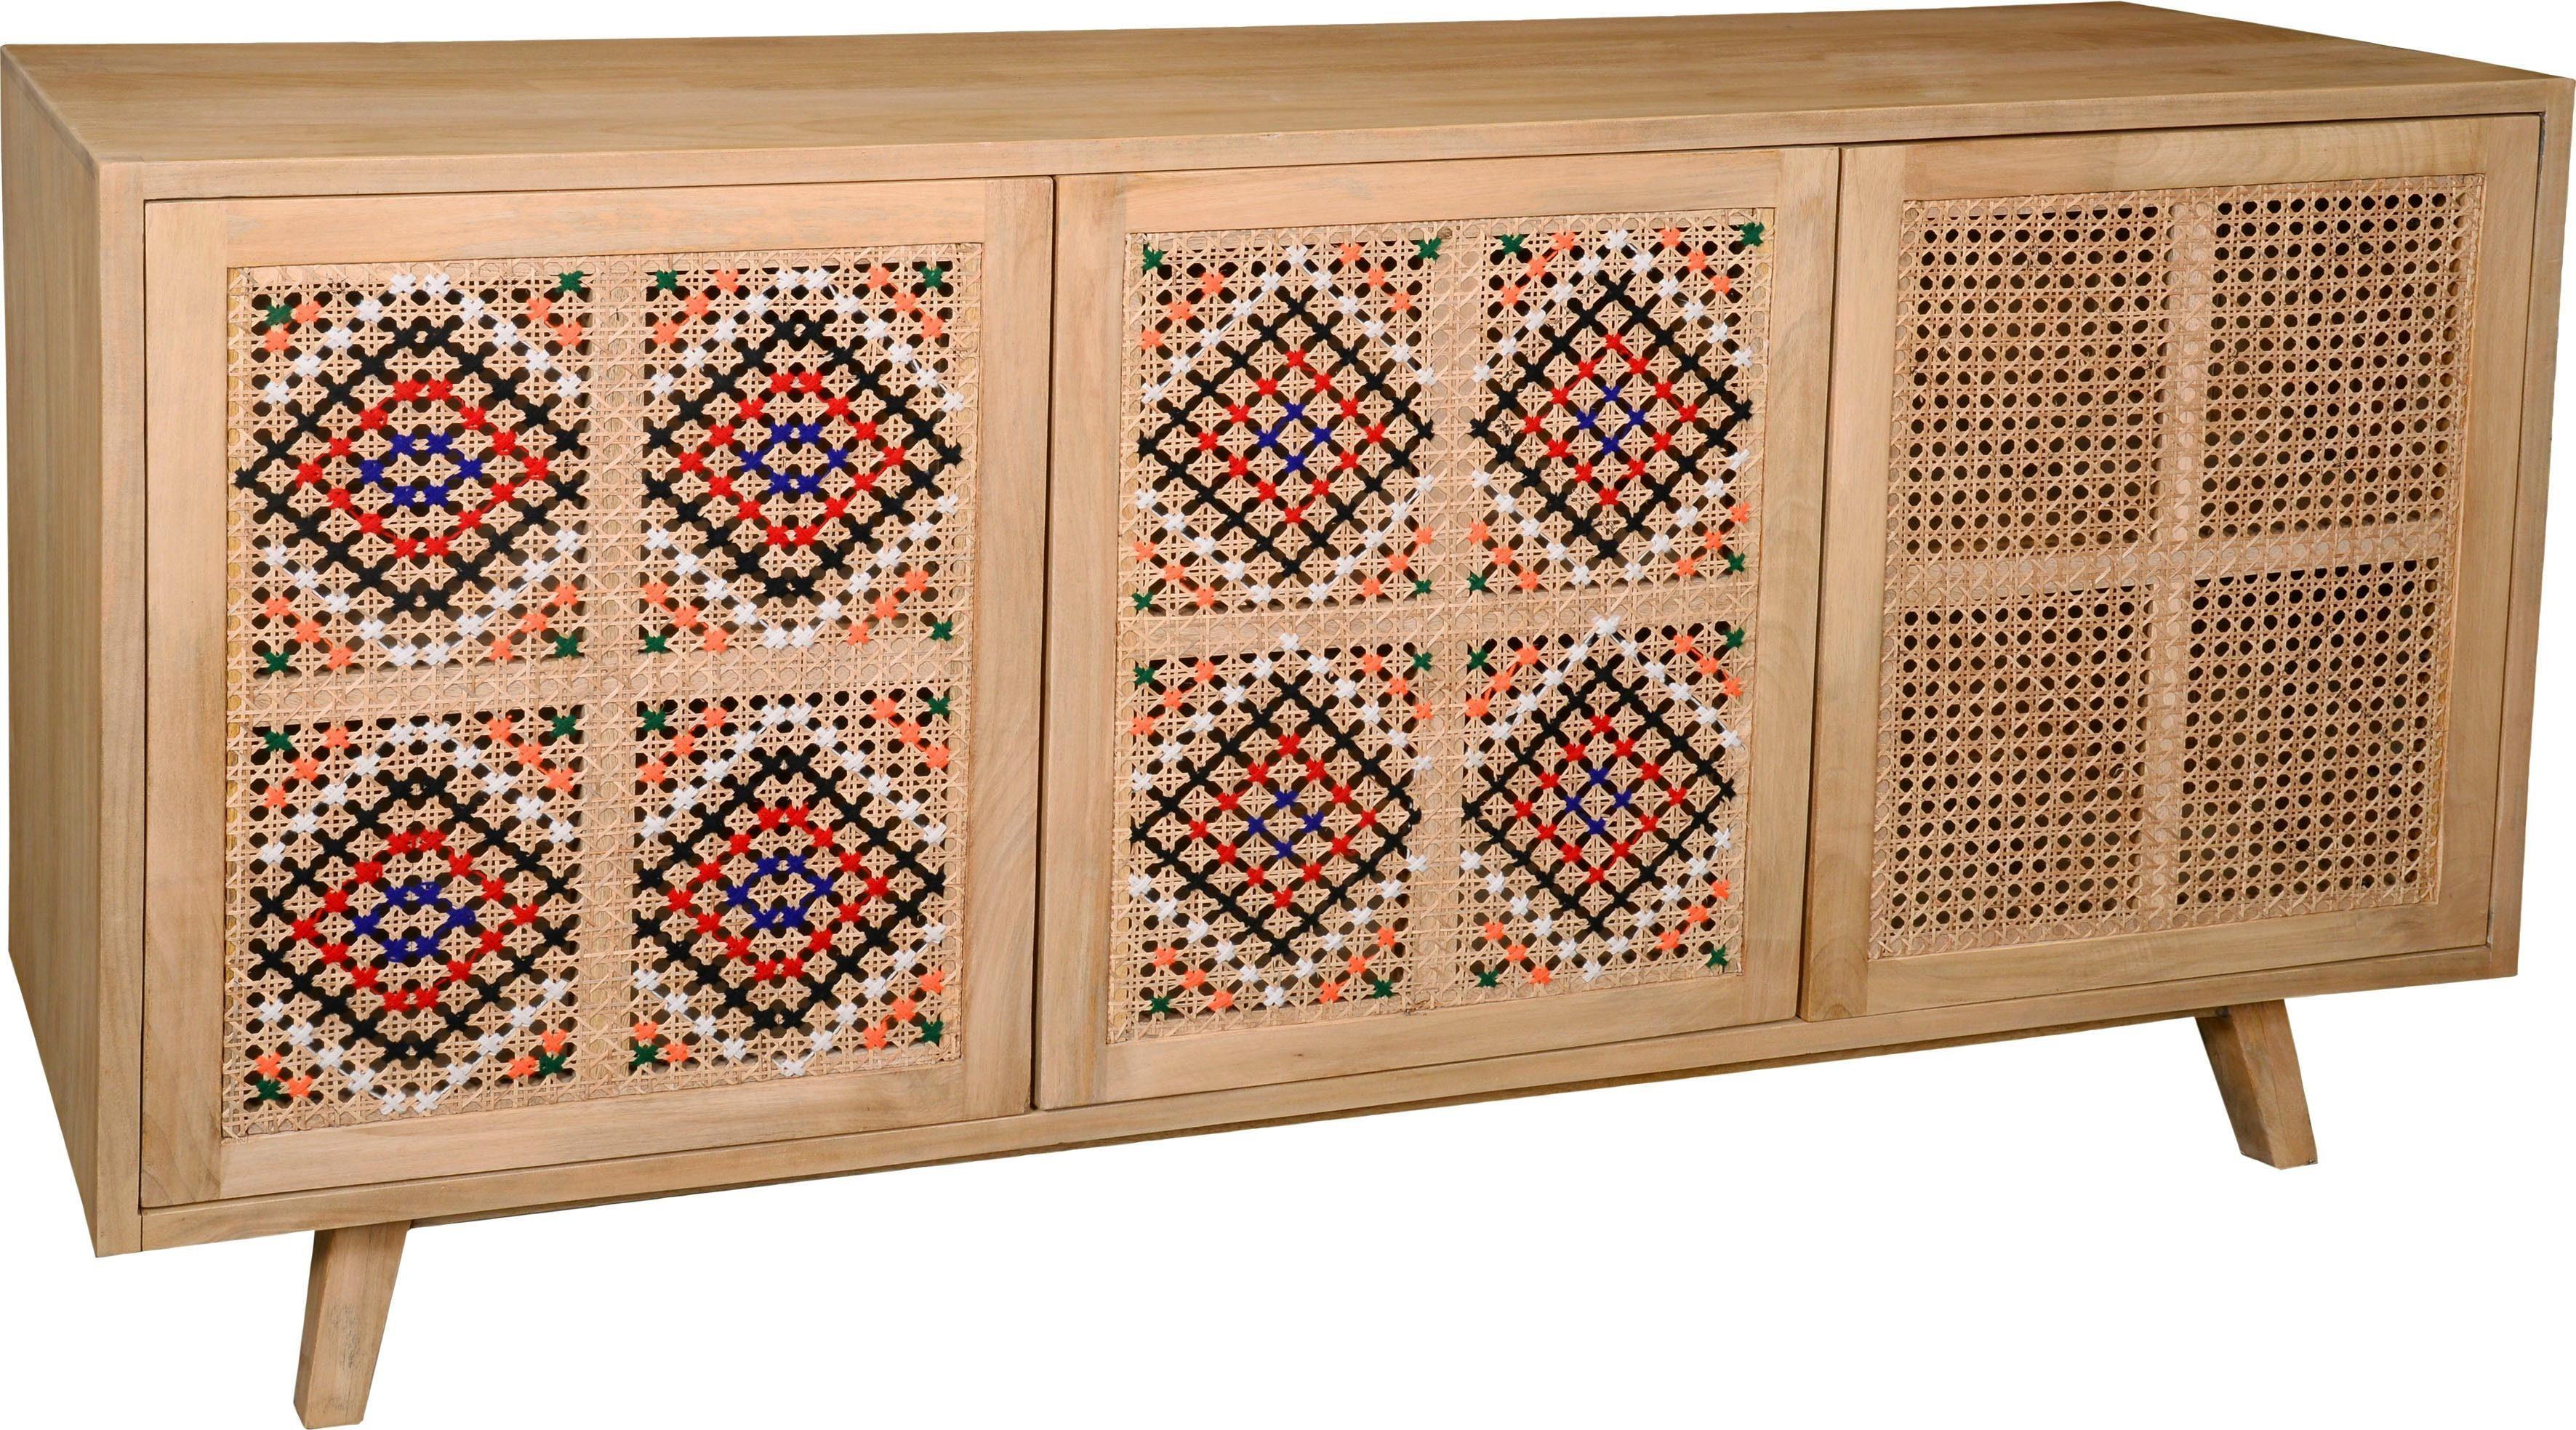 The Wood Times Sideboard »Korba«, Fronten Korbgeflecht mit farbigen Bändern dekoriert